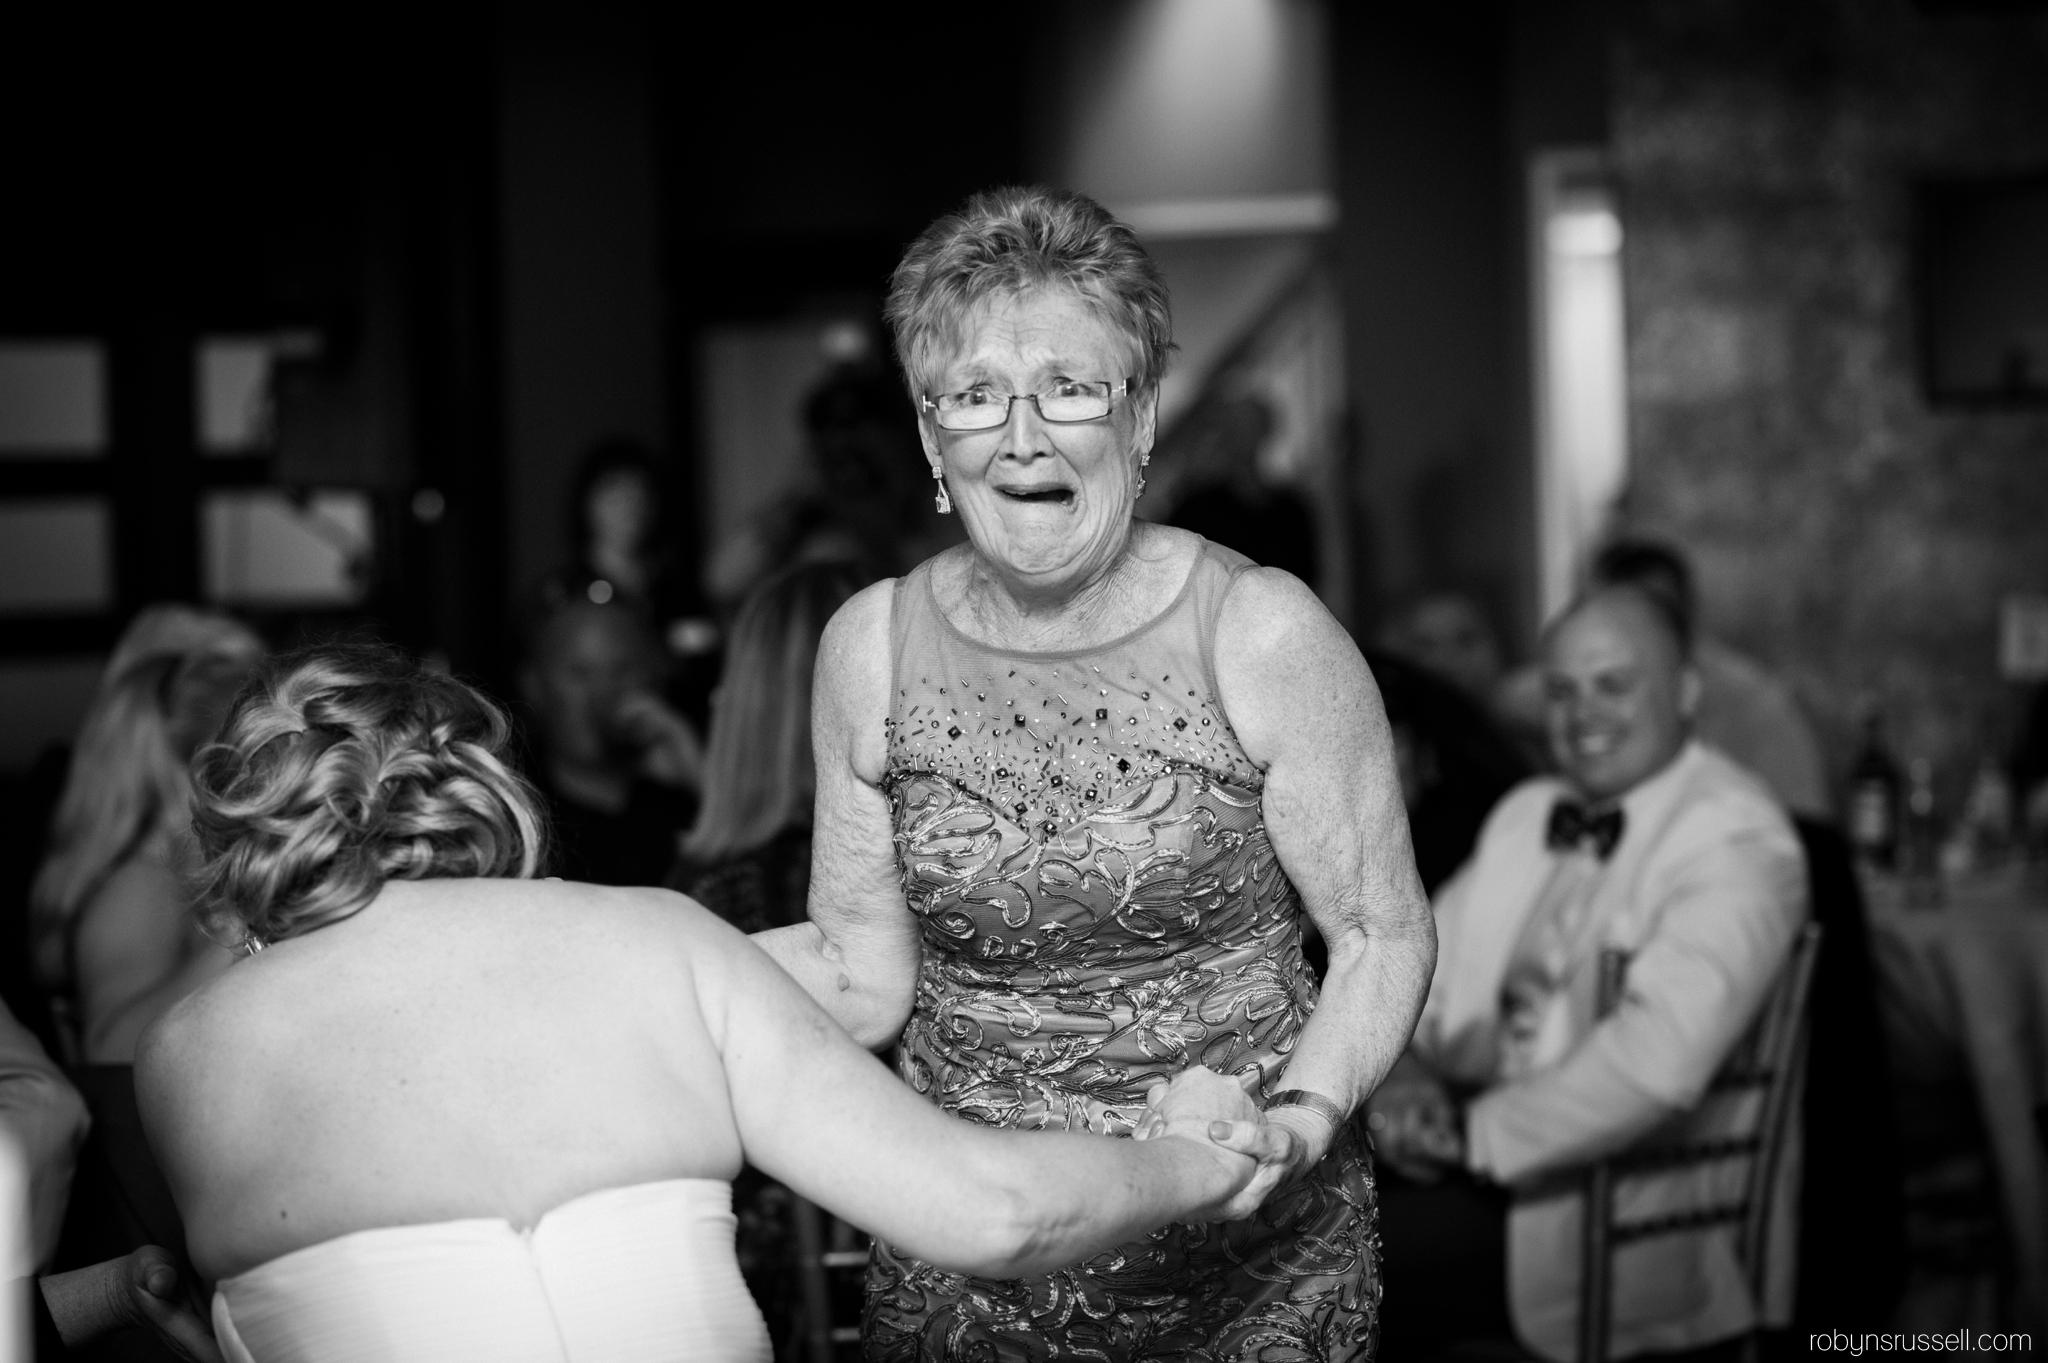 37-bride-falls-during-dance-oakville-wedding.jpg